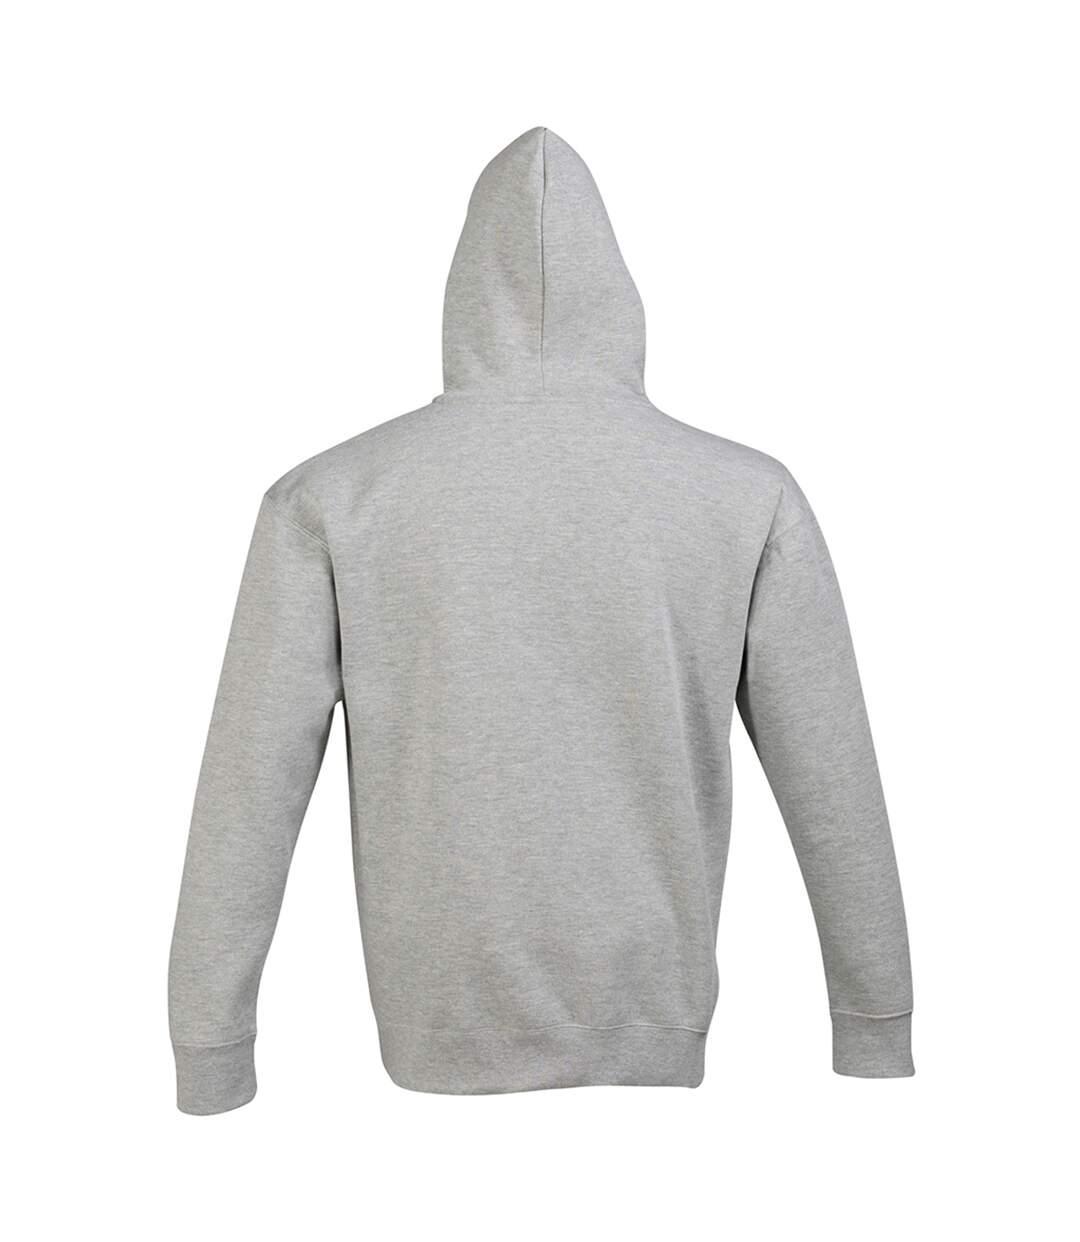 SOLS Slam Unisex Hooded Sweatshirt / Hoodie (Turquoise) - UTPC381